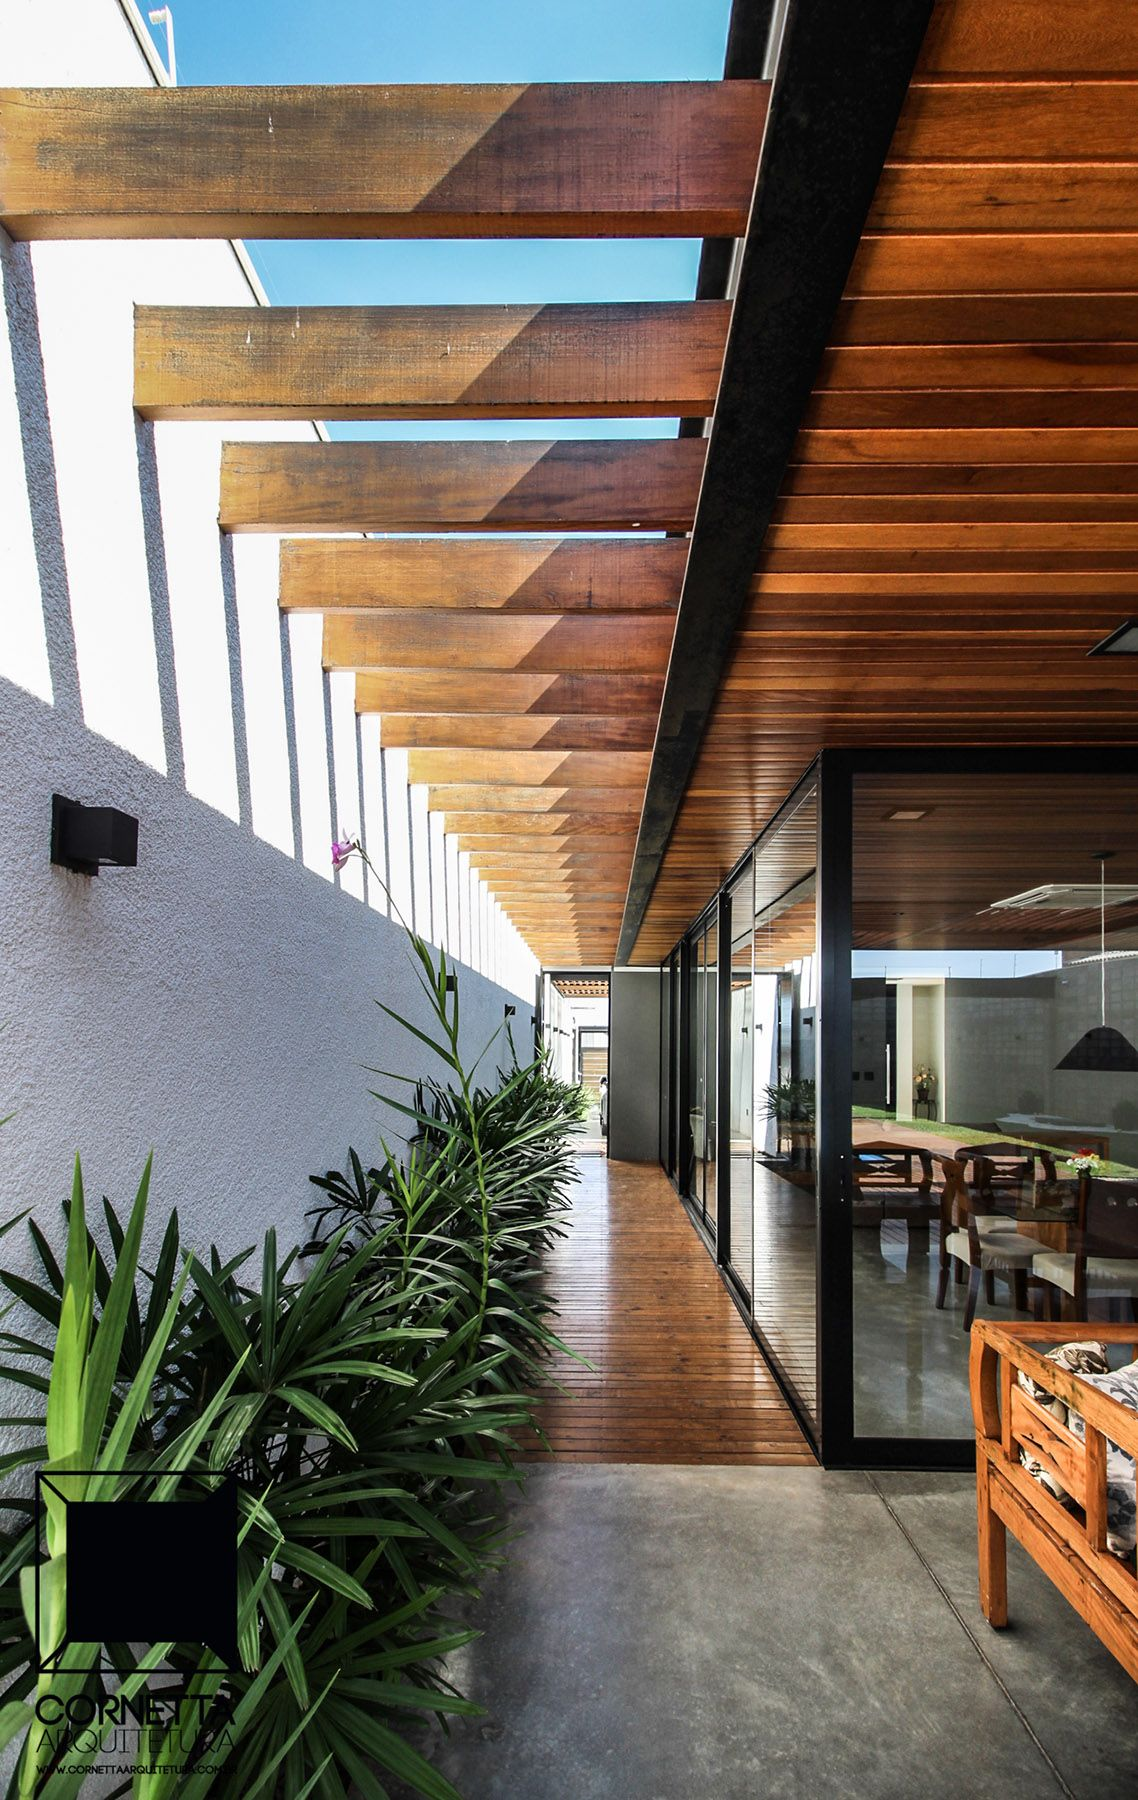 Cornetta arquitetura casas terreas estruturas metalicas - Pergolas de cemento ...